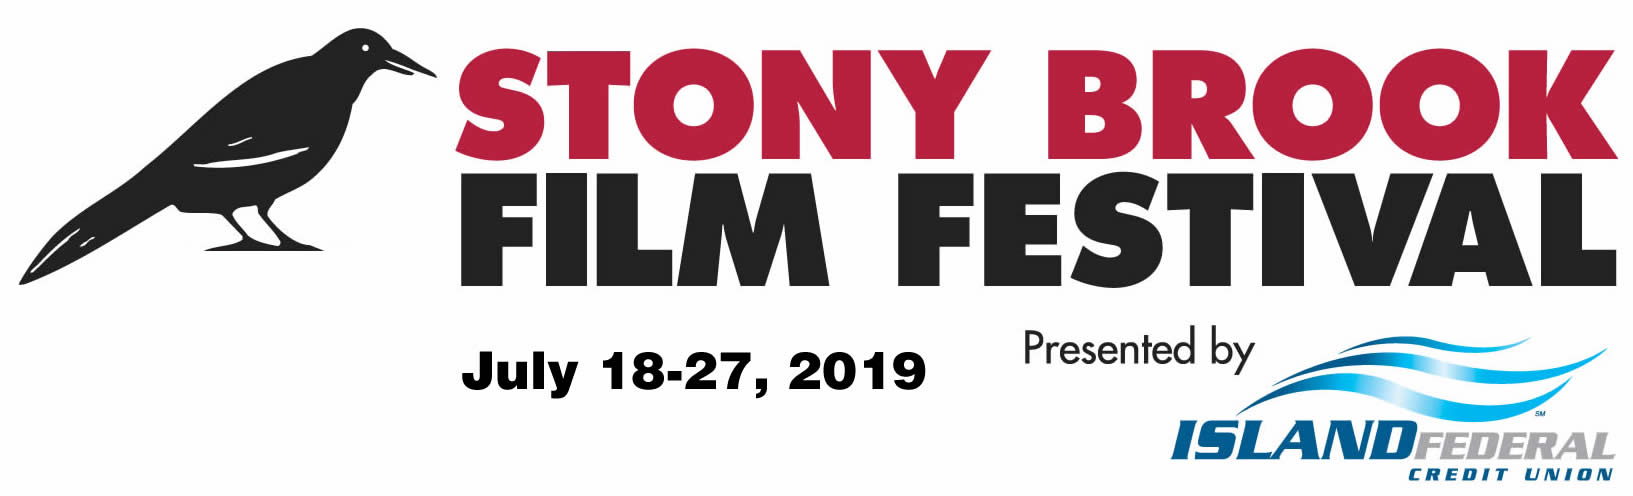 Calendar Stony Brook Film Festival